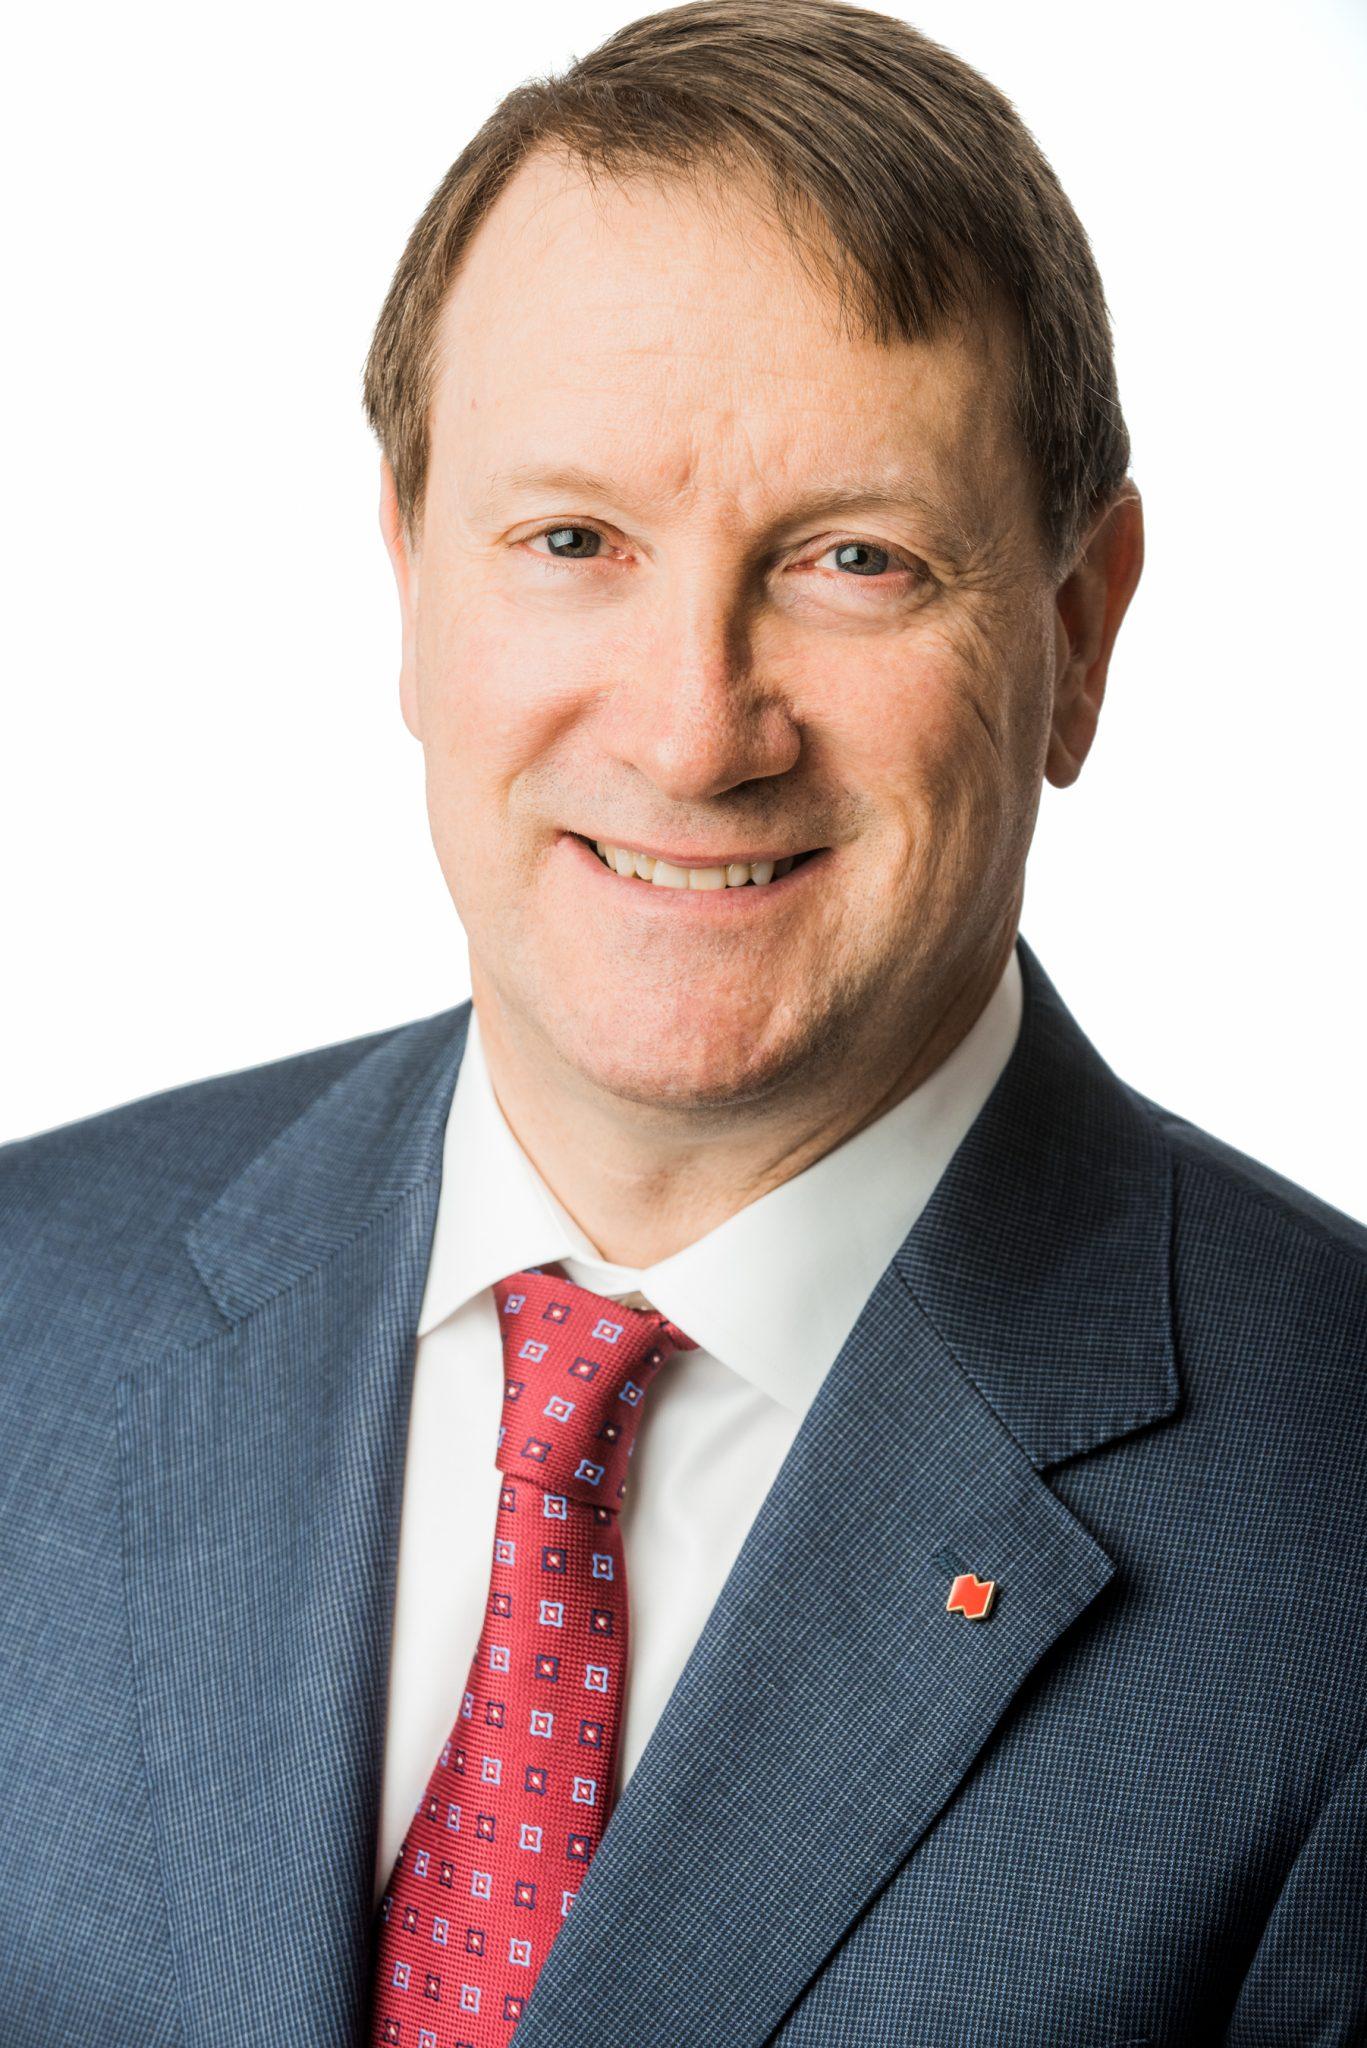 National Bank of Canada CEO Louis Vachon